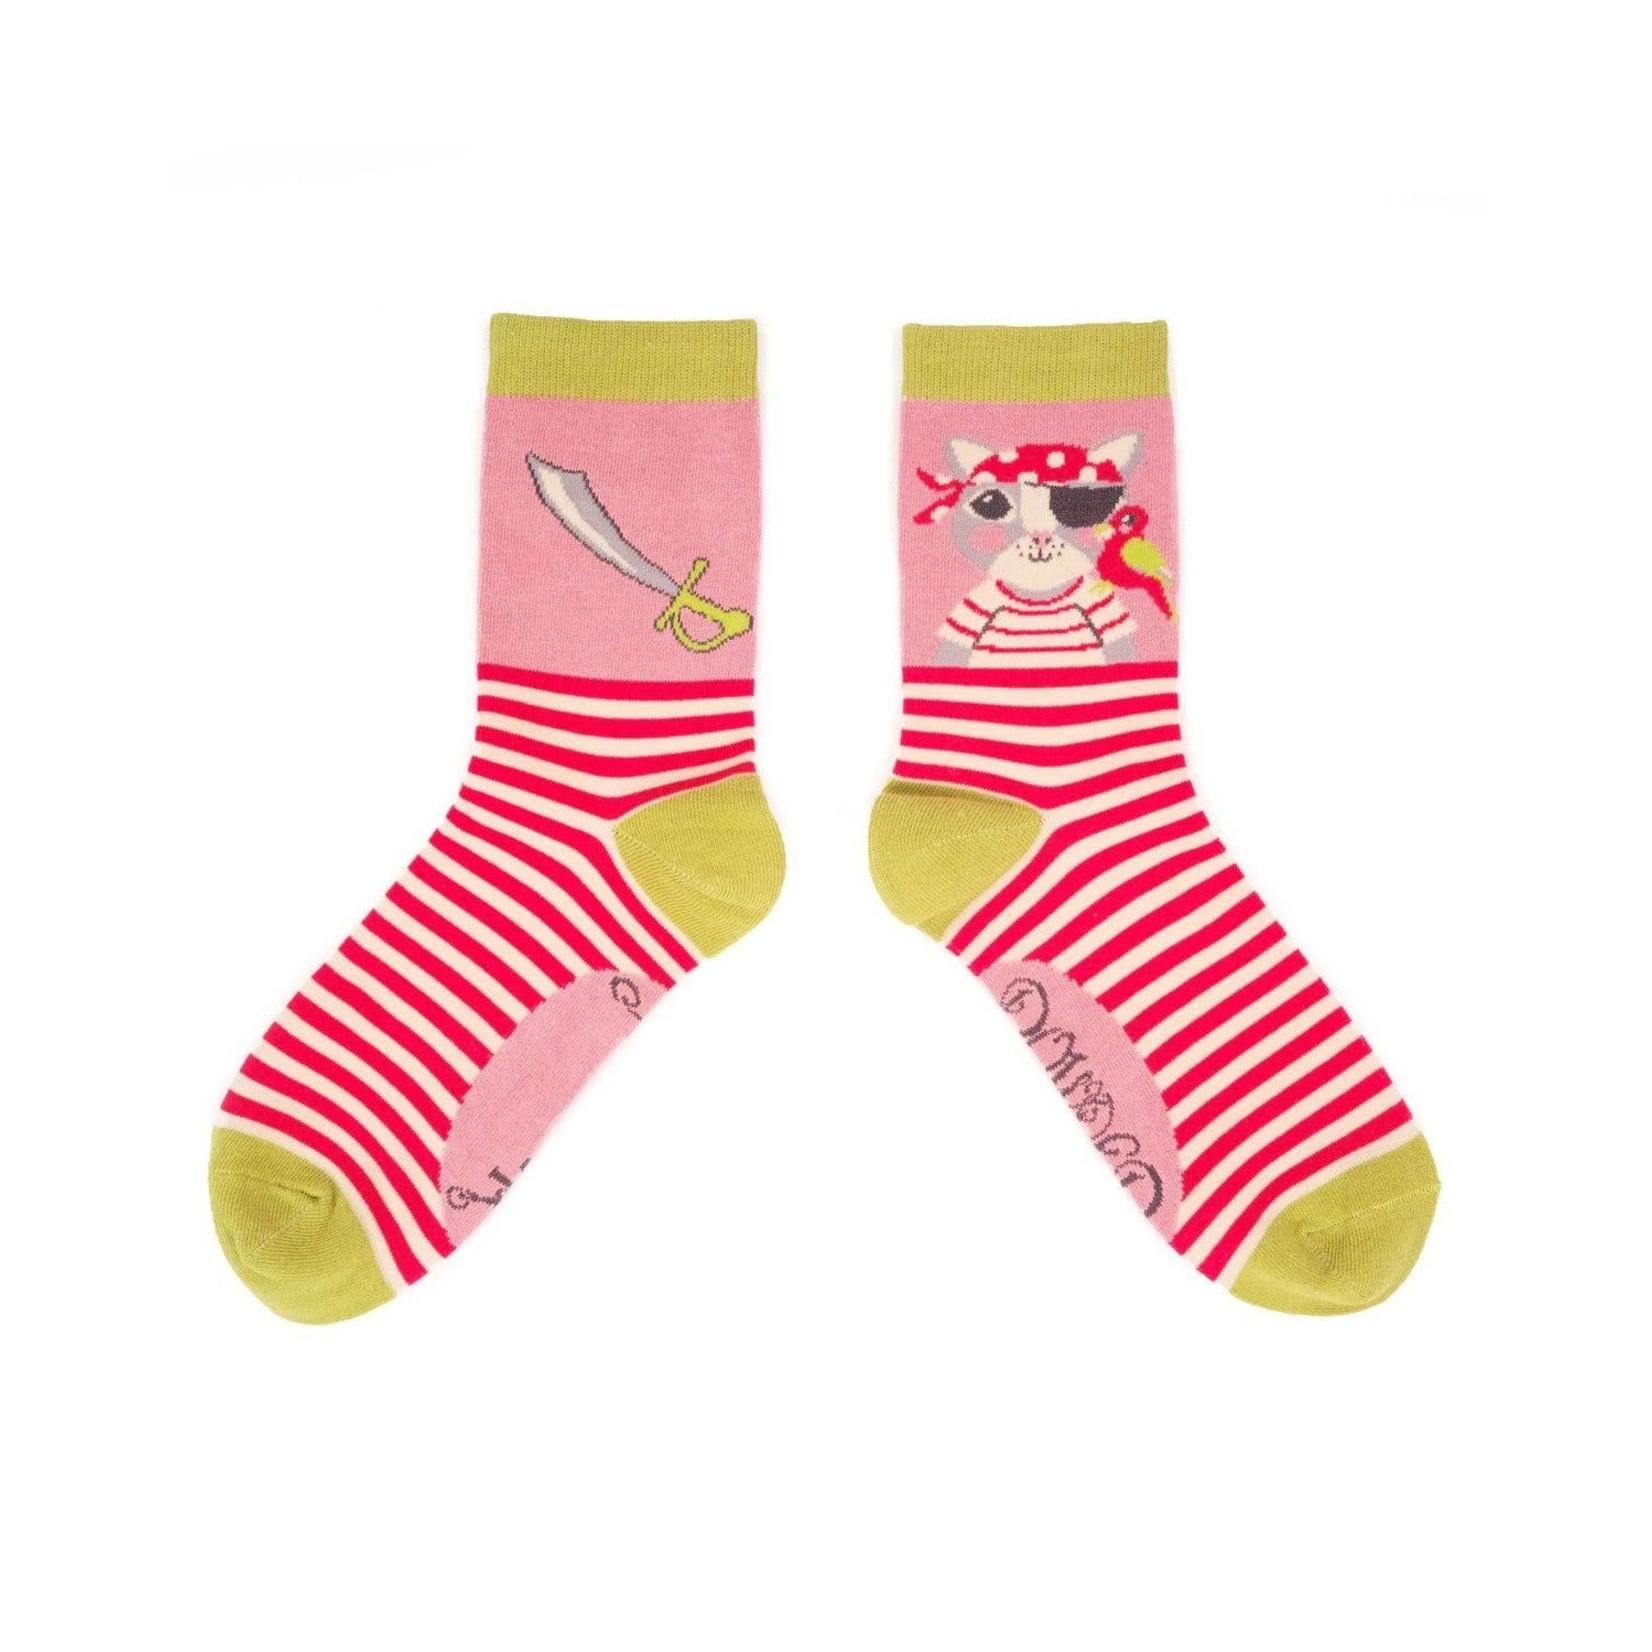 Powder Pirate Pussycat Ankle Socks